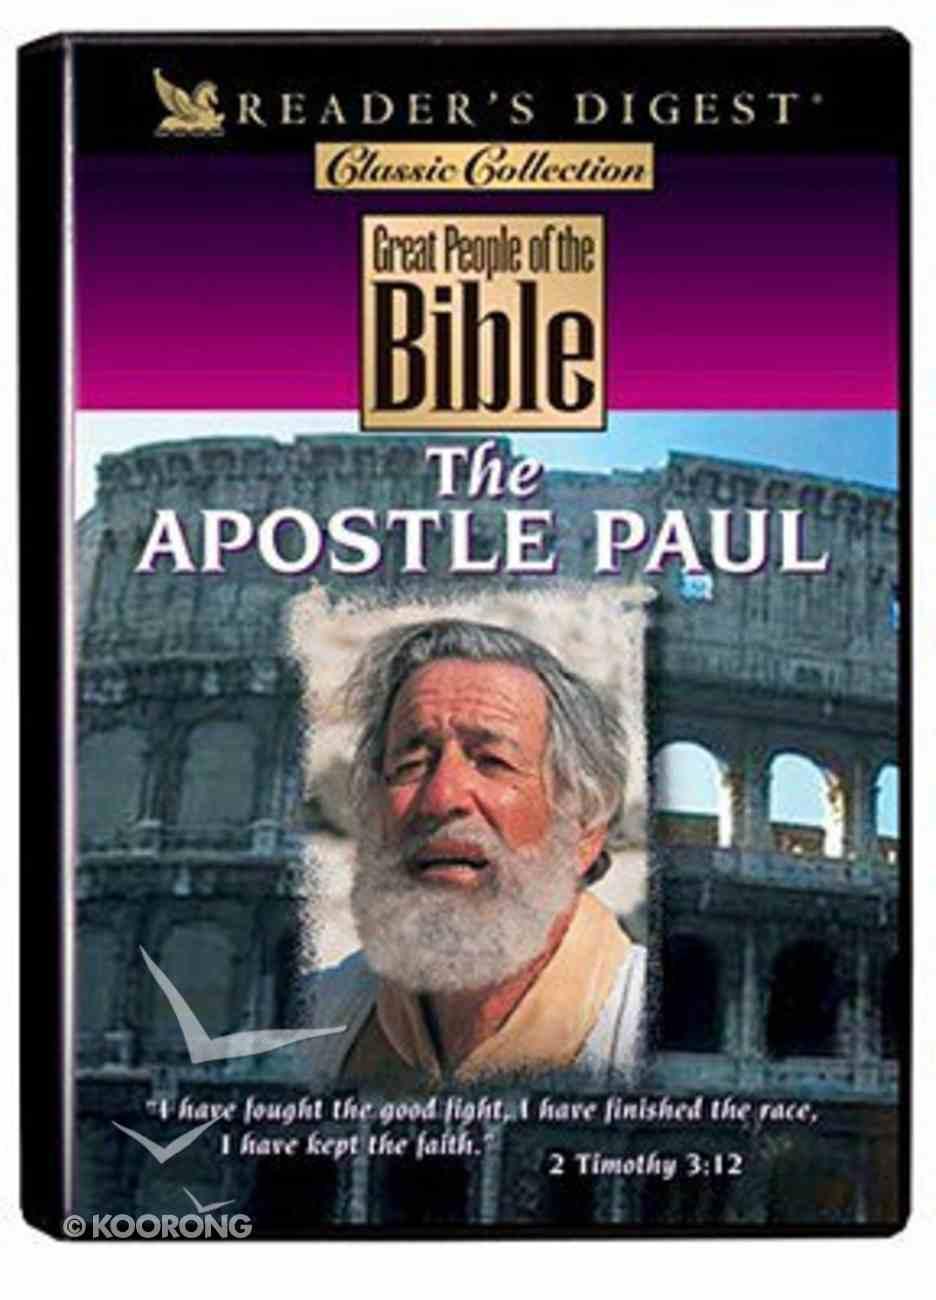 The Apostle Paul DVD